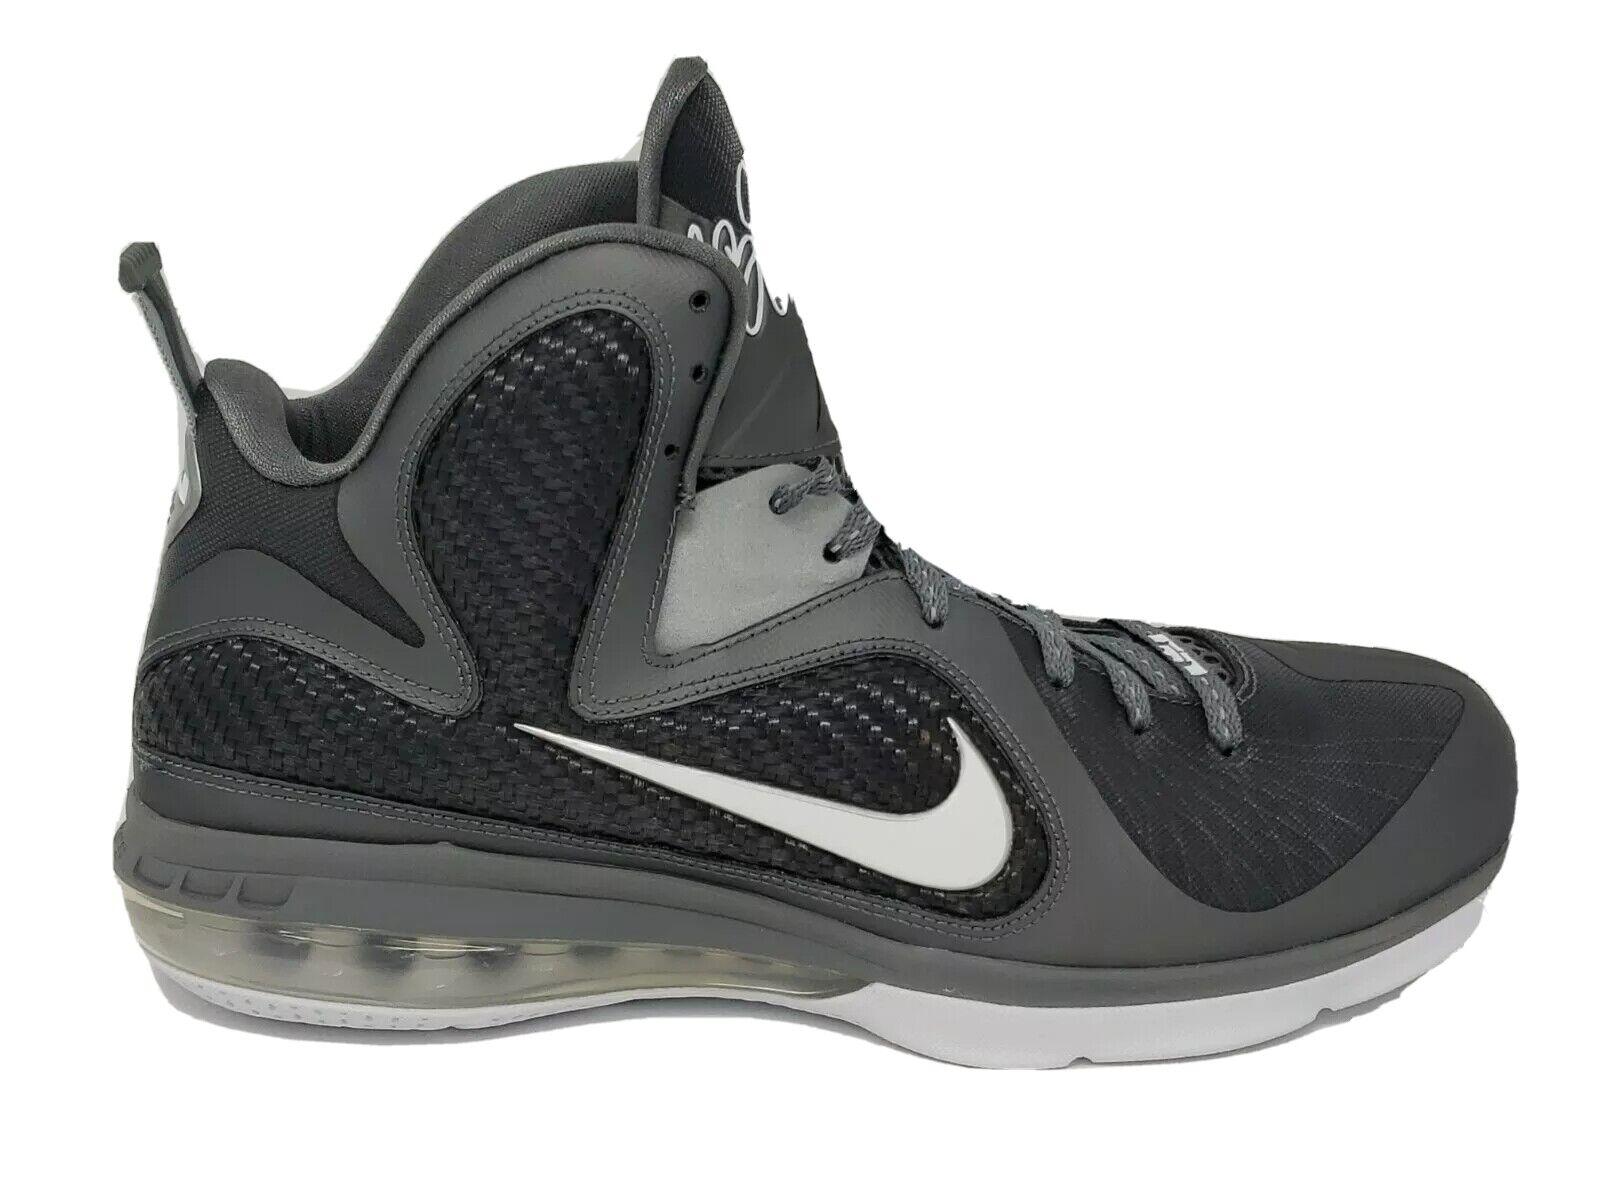 DS Nike Lebron 9 Cool Grey 11 White